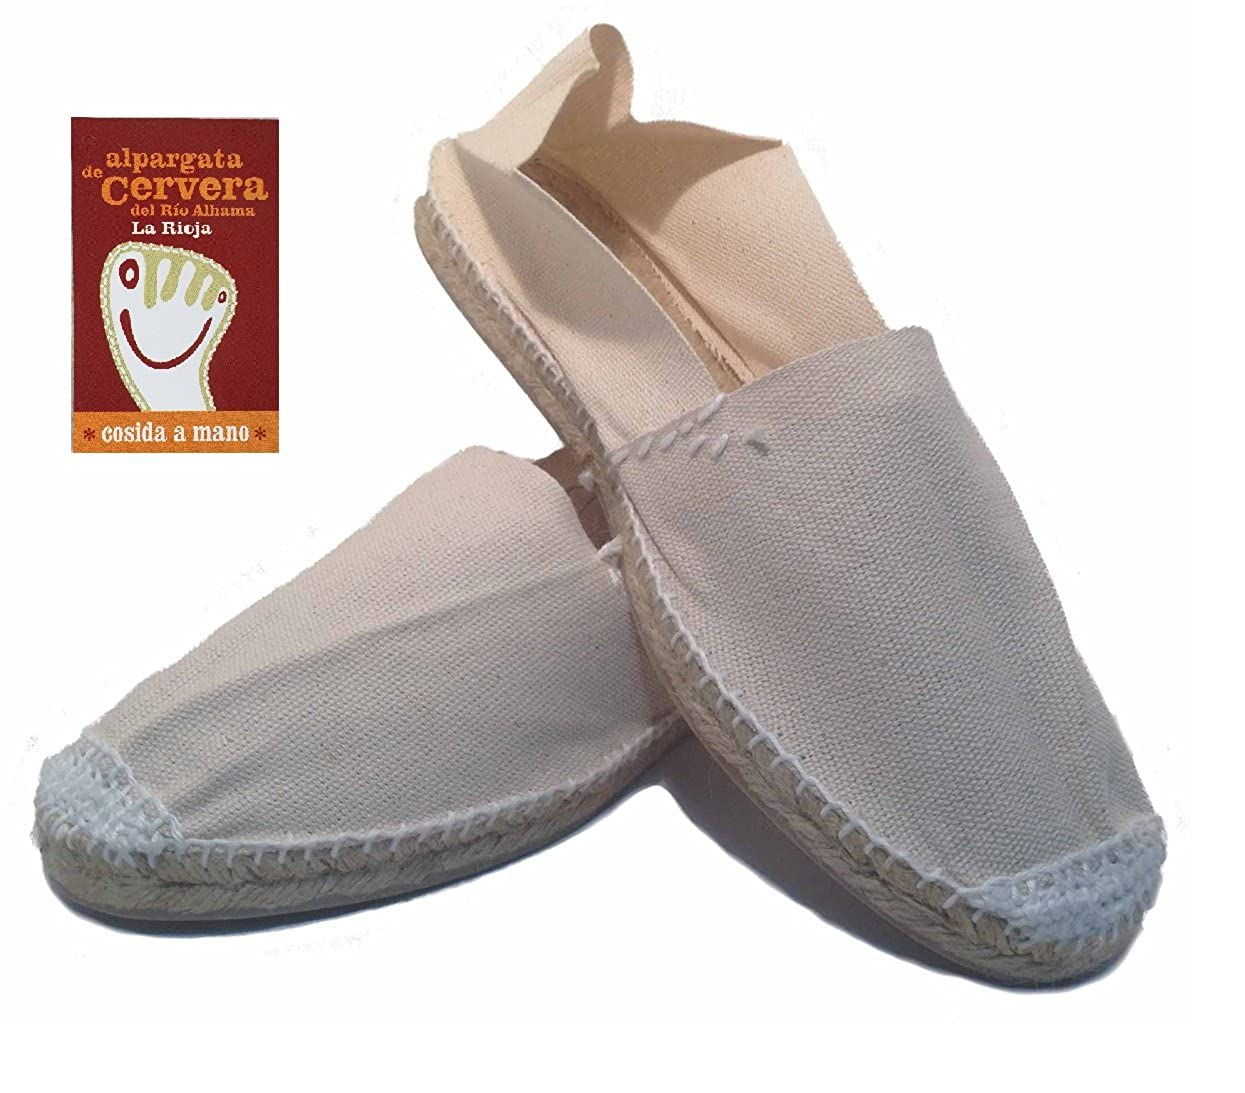 Amazon.com | Espadrilles Alpargatas Made in Spain Model Classic Flat Hand Sewn Original Cervera del Rio Alhama La Rioja | Shoes